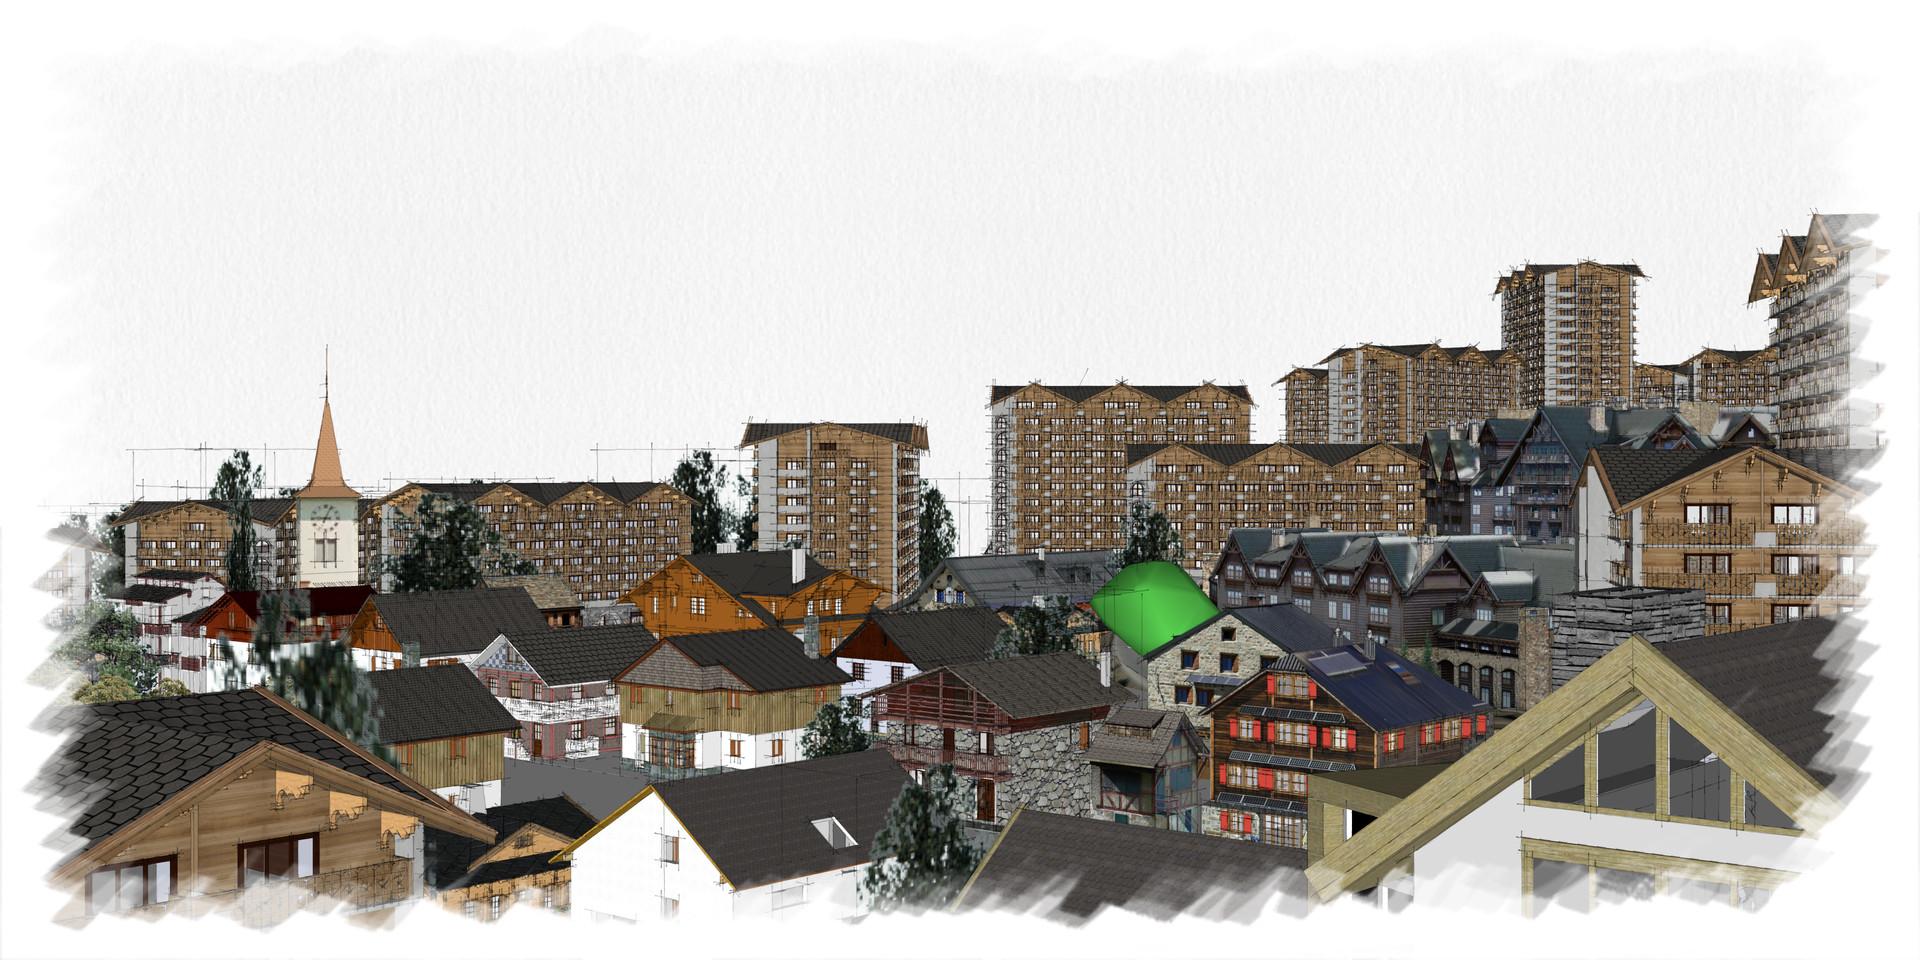 Duane kemp alpine village full scene 5 2x1 02 su c